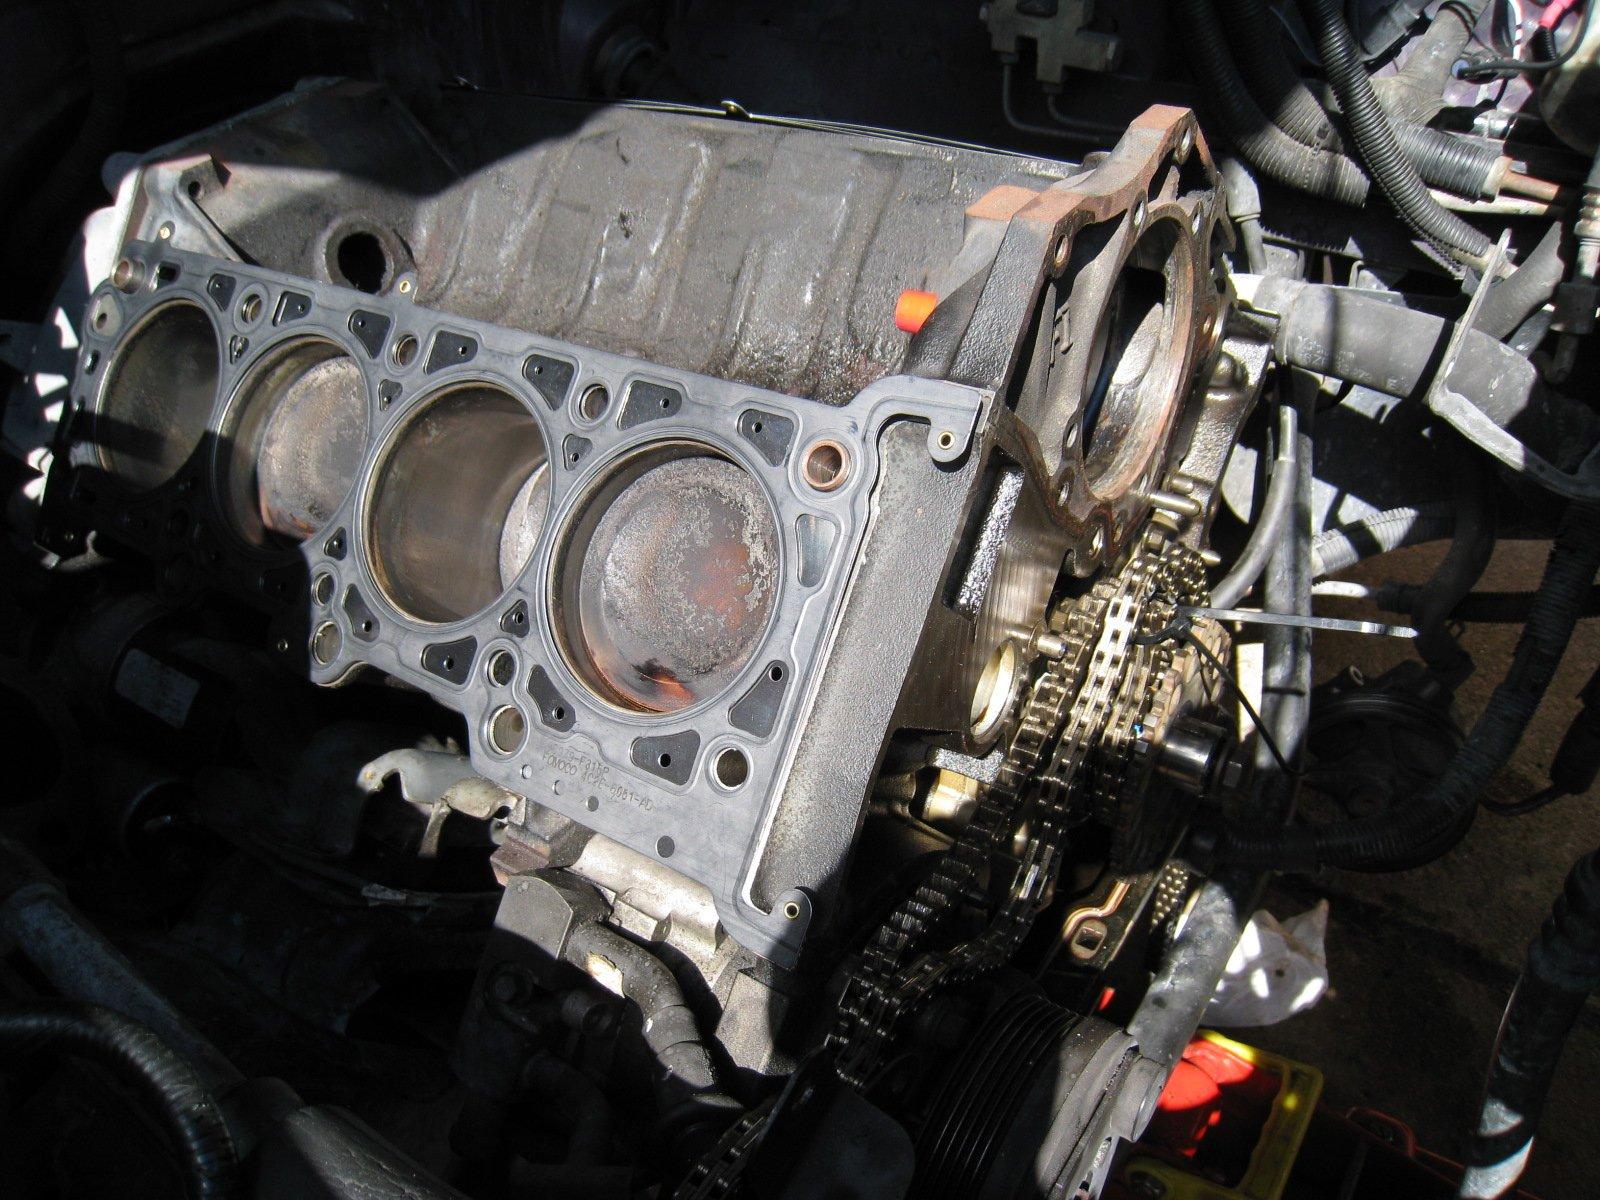 1996 Mustang Gt Pi swap, Oil leak - Ford Mustang Forum